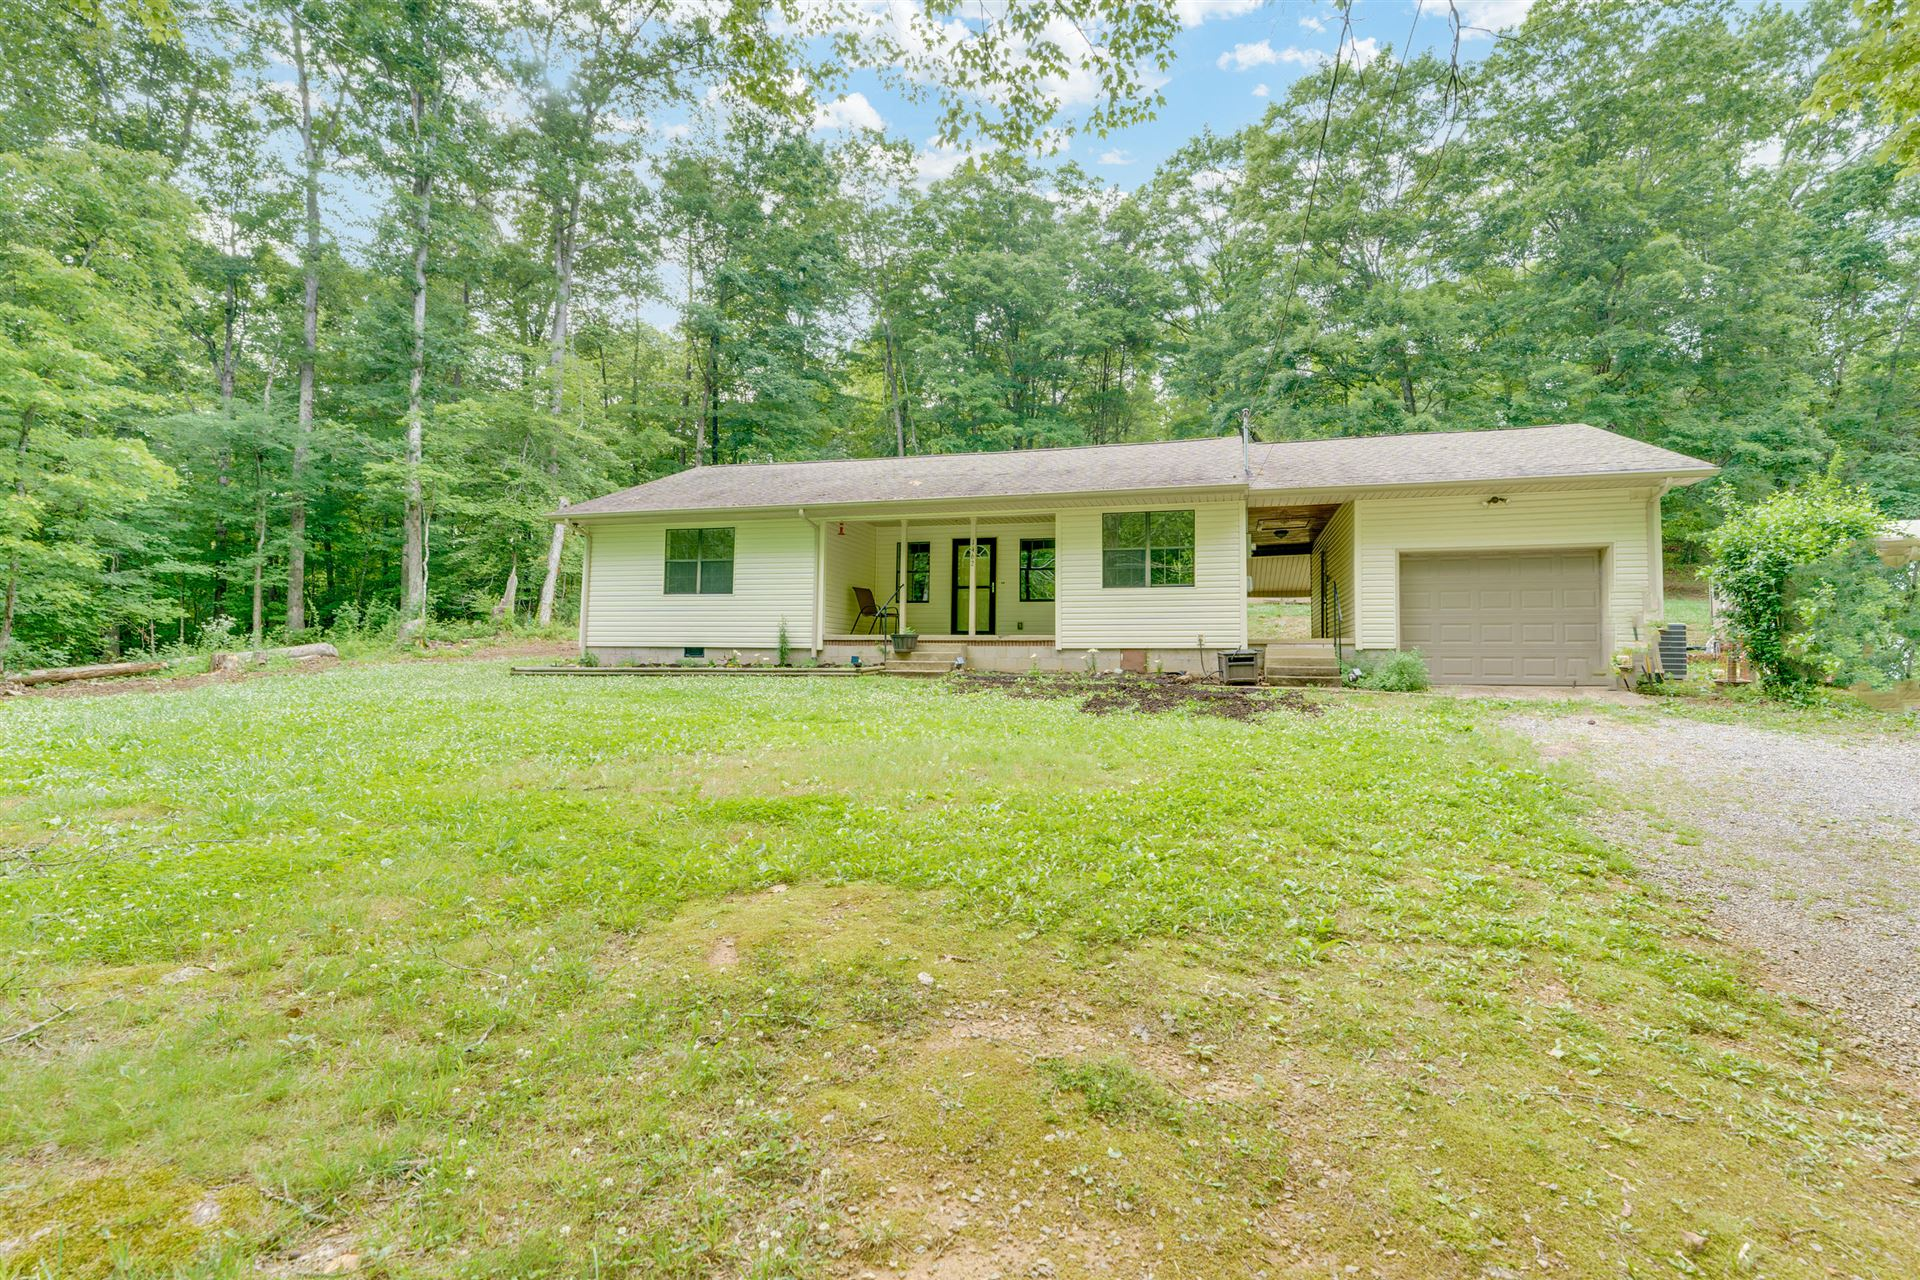 Photo of 1462 Ridgeview Drive, Clinton, TN 37716 (MLS # 1156201)